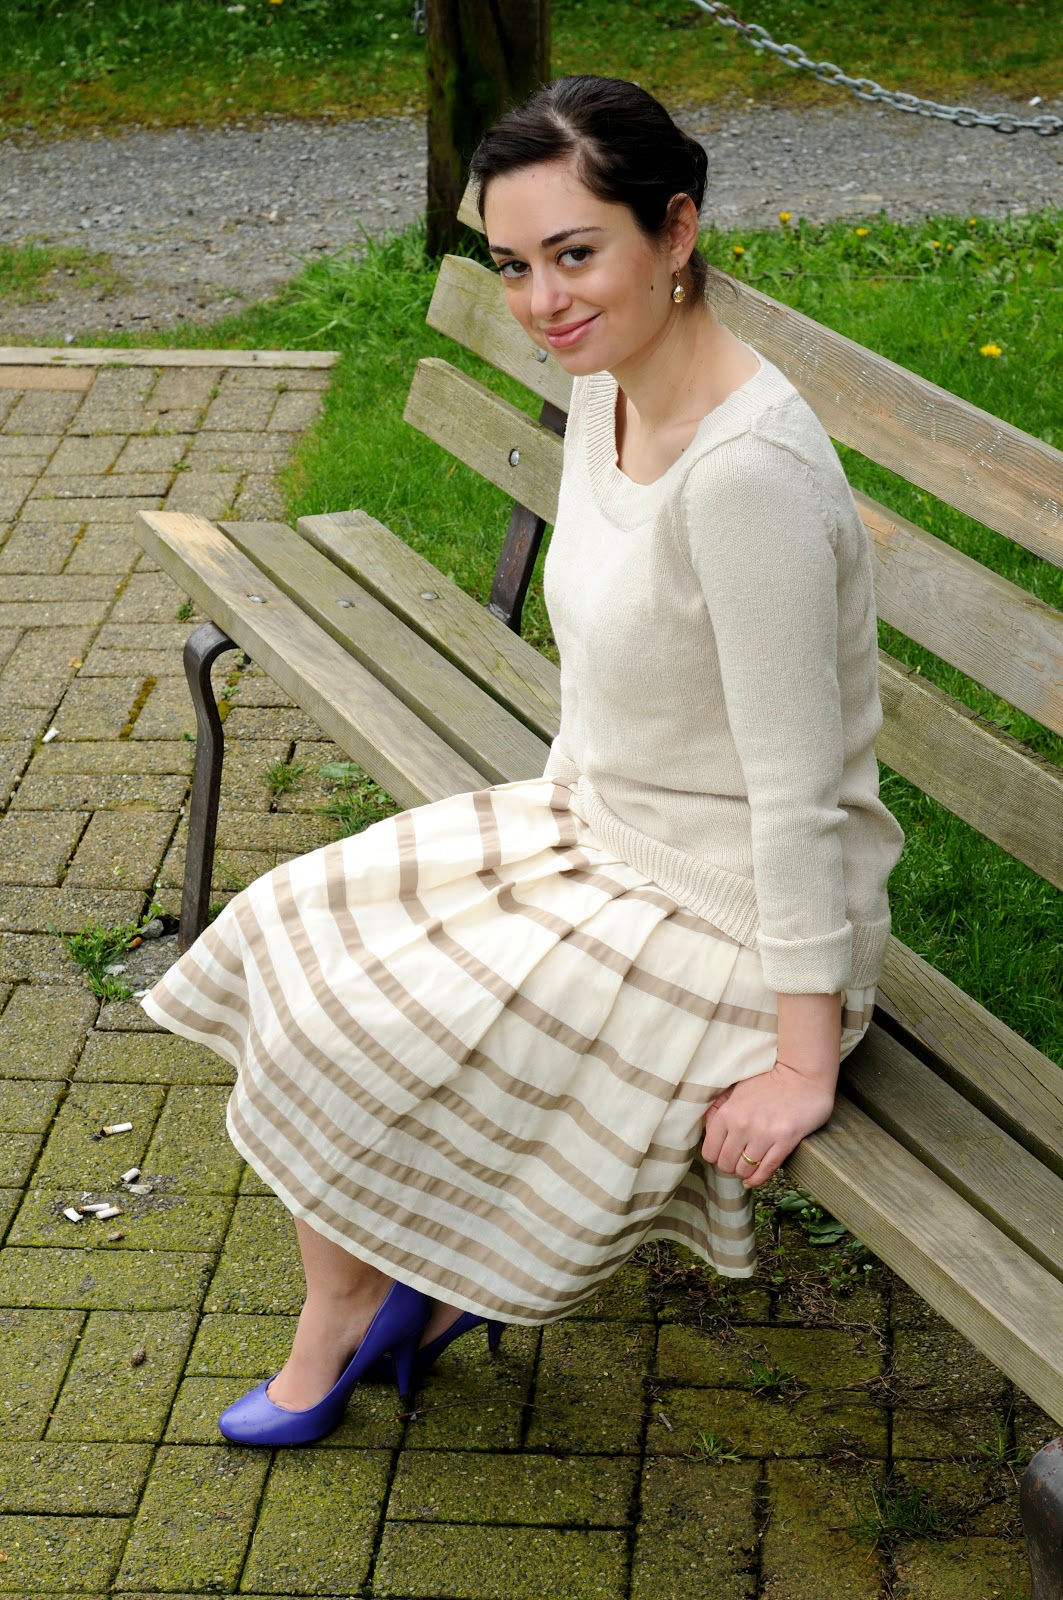 Anna Kendrick Up Skirt Club monaco skirt,